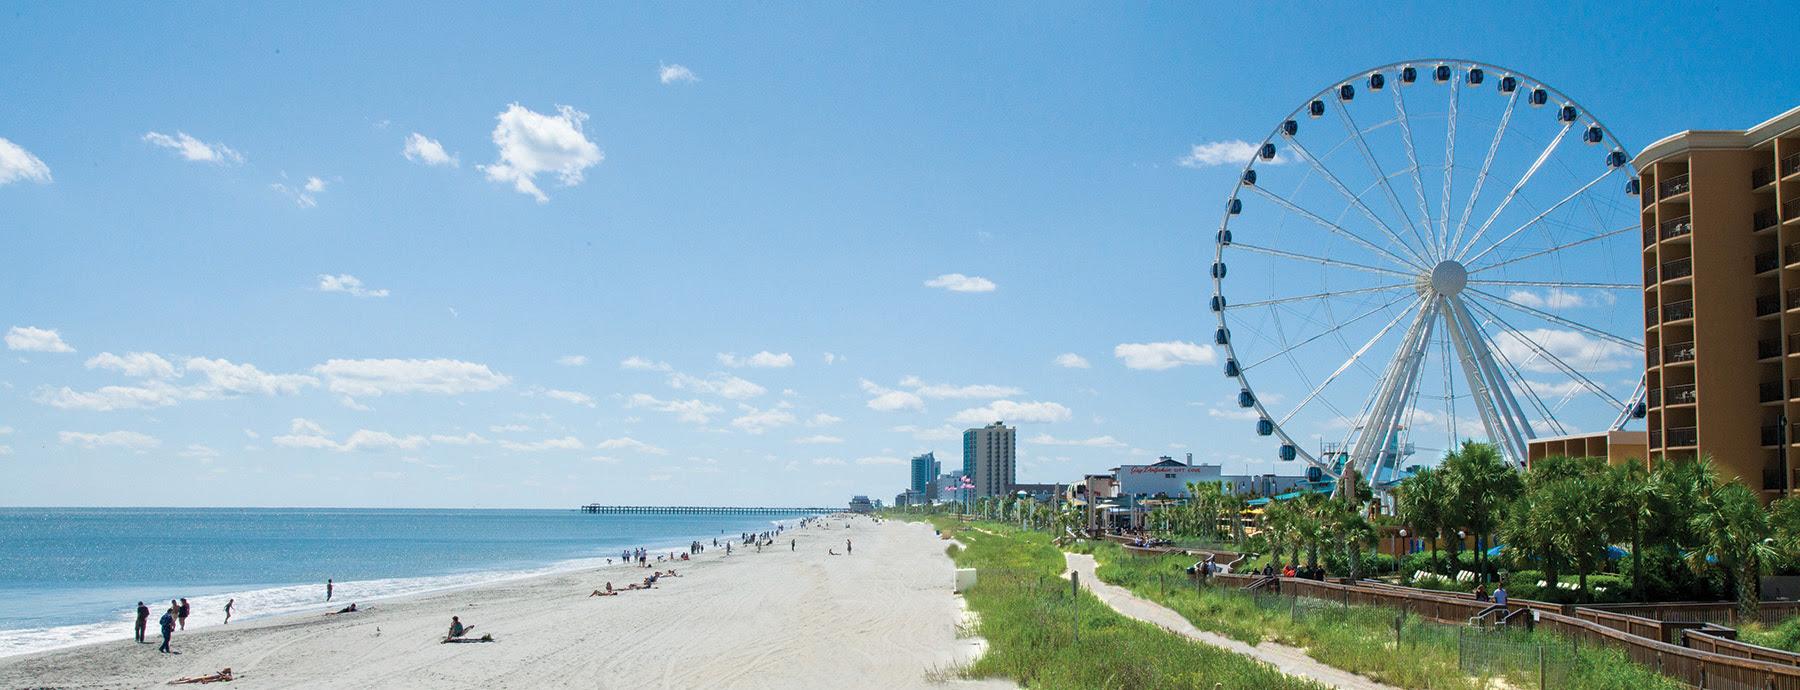 Myrtle Beach Oceanfront Resort South Carolina Hotels